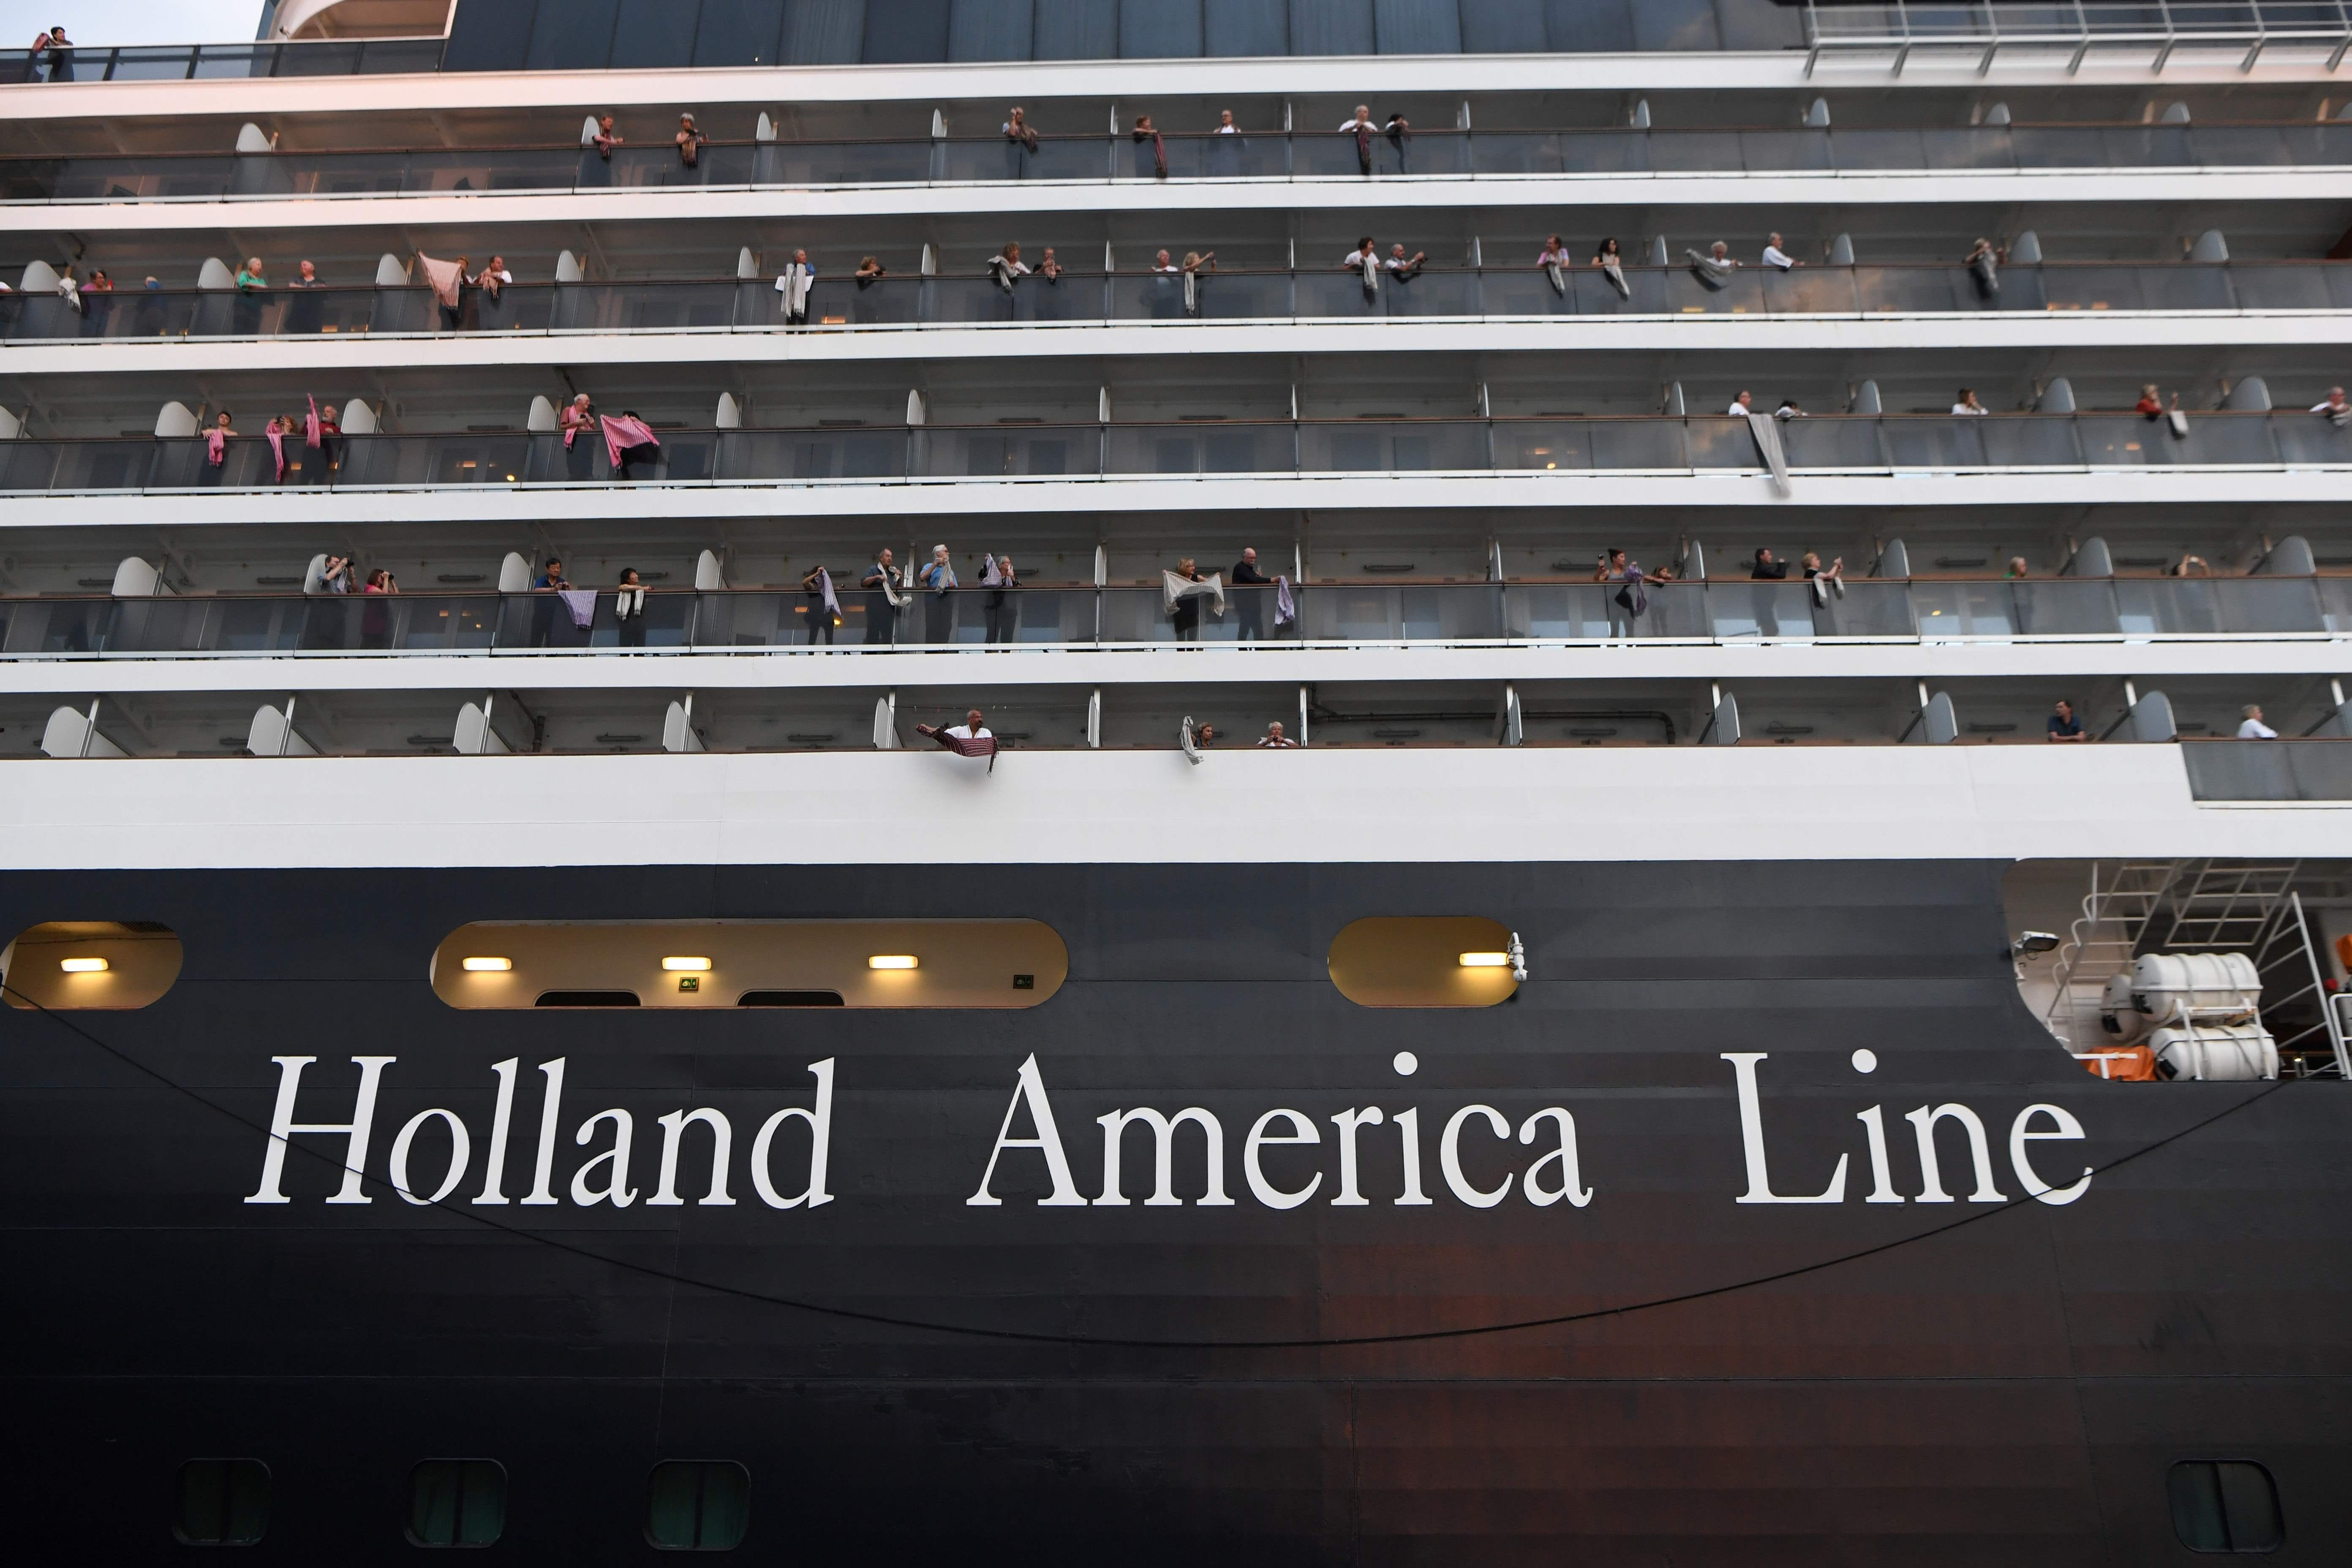 American woman, 83, tests positive for coronavirus after disembarking Holland America ship